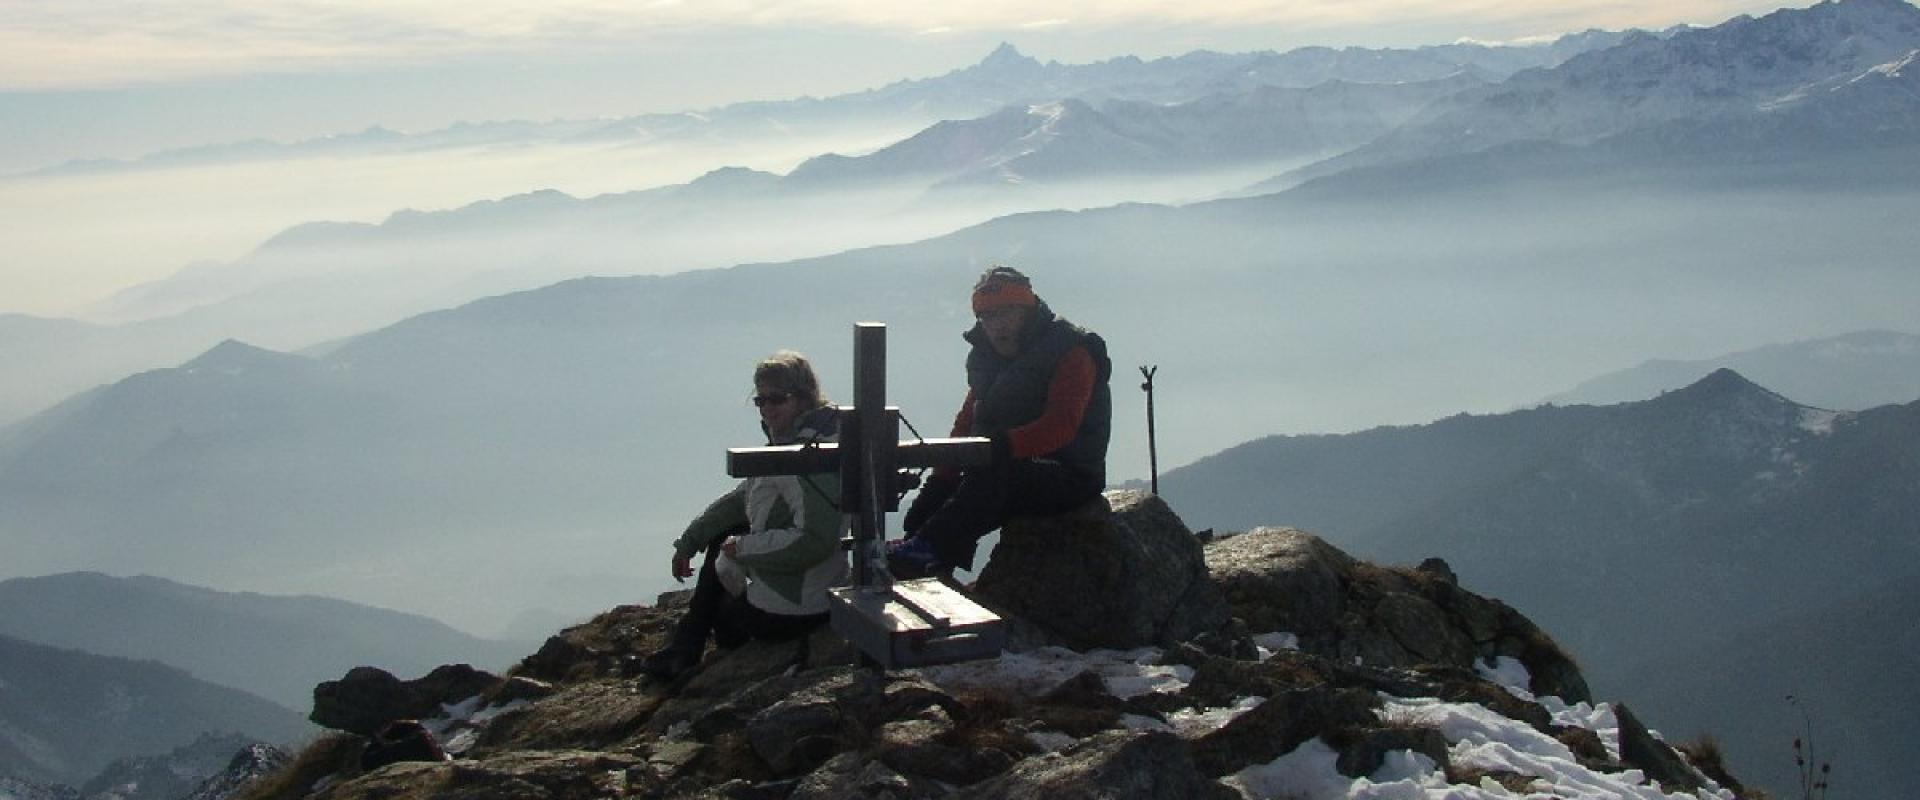 Trekking on the highest peak of Sardinia